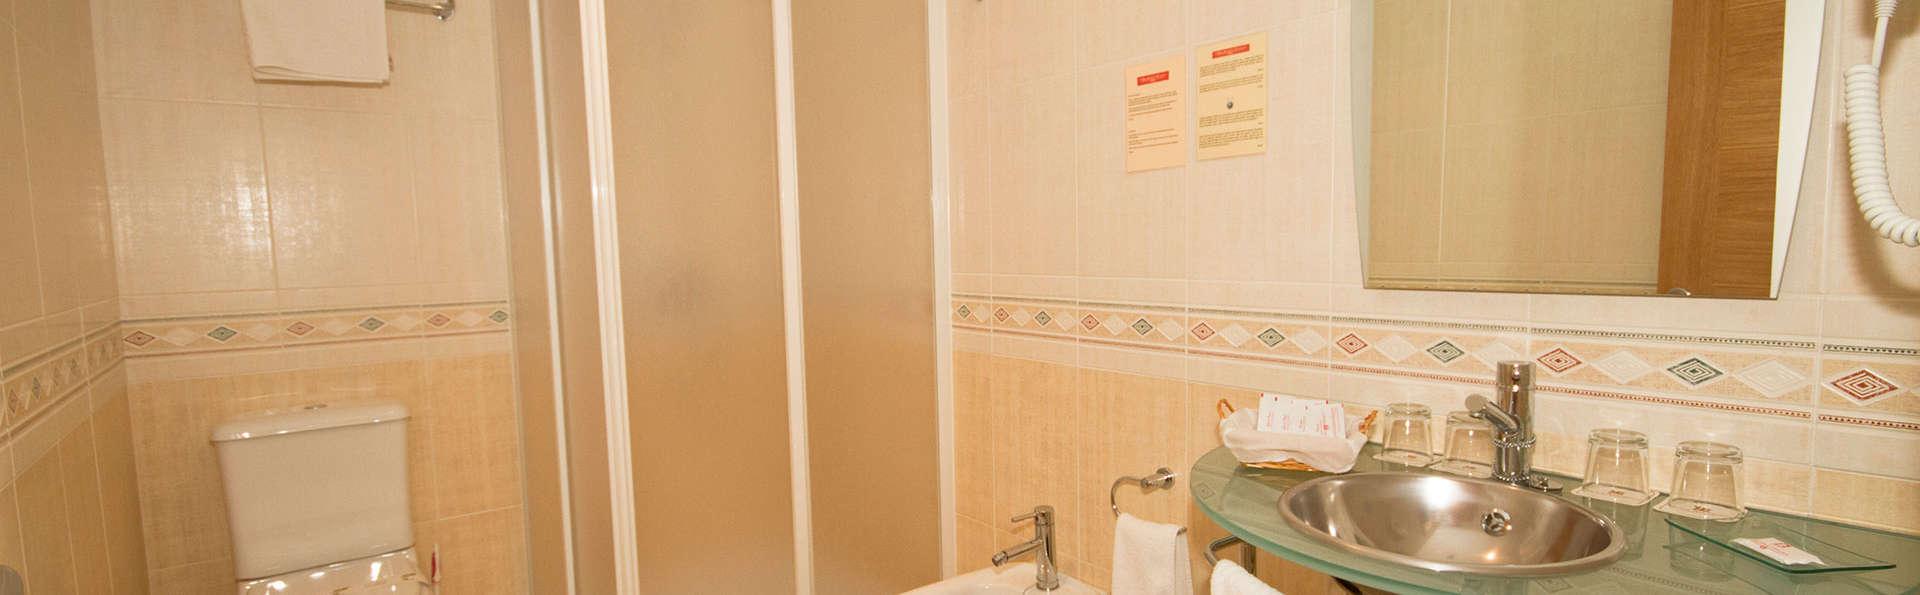 Aparthotel Arenteiro - EDIT_bath.jpg